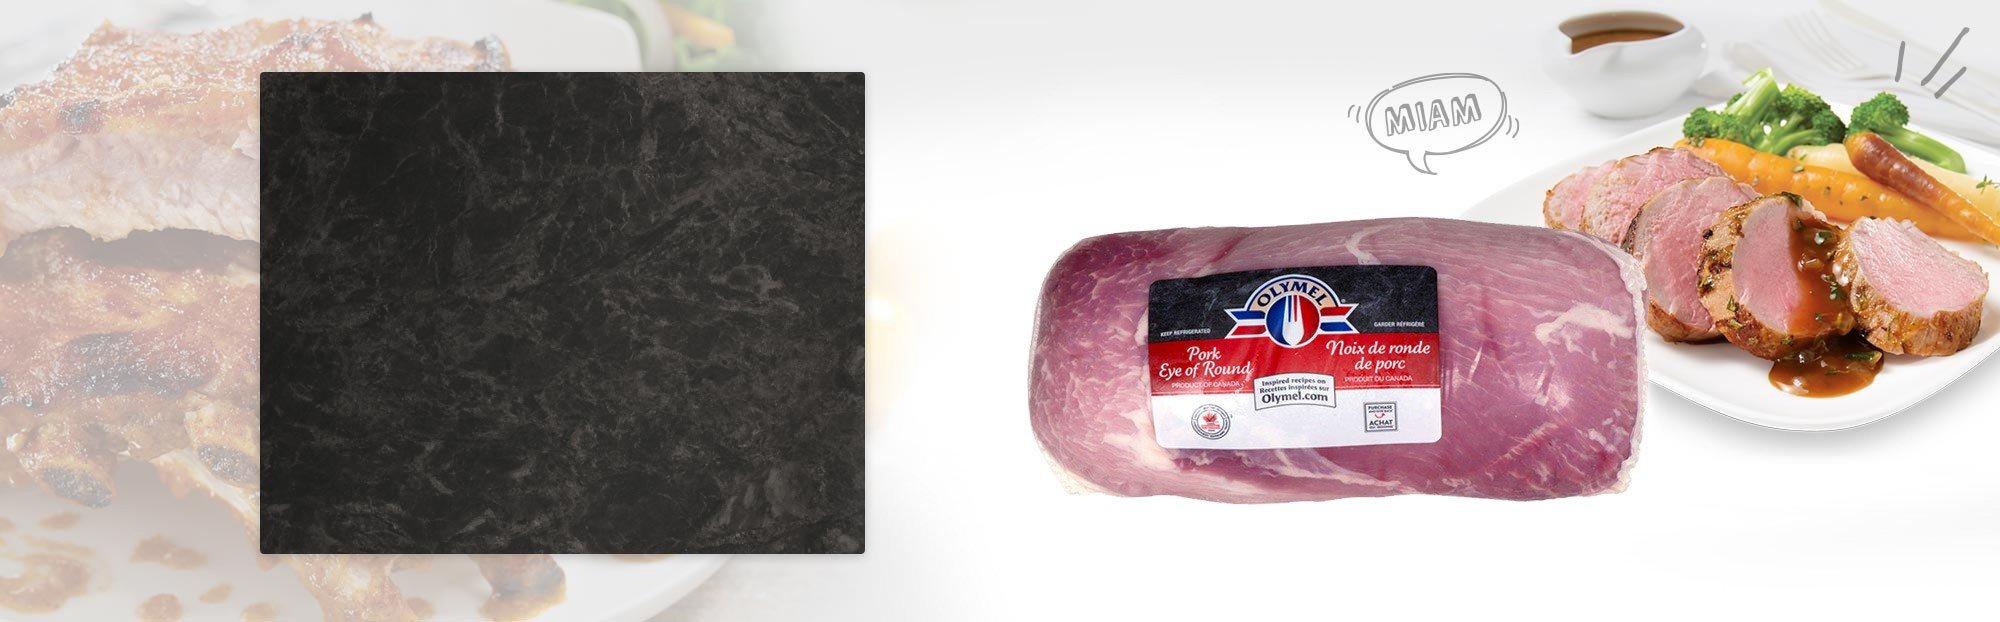 Noix de ronde de porc